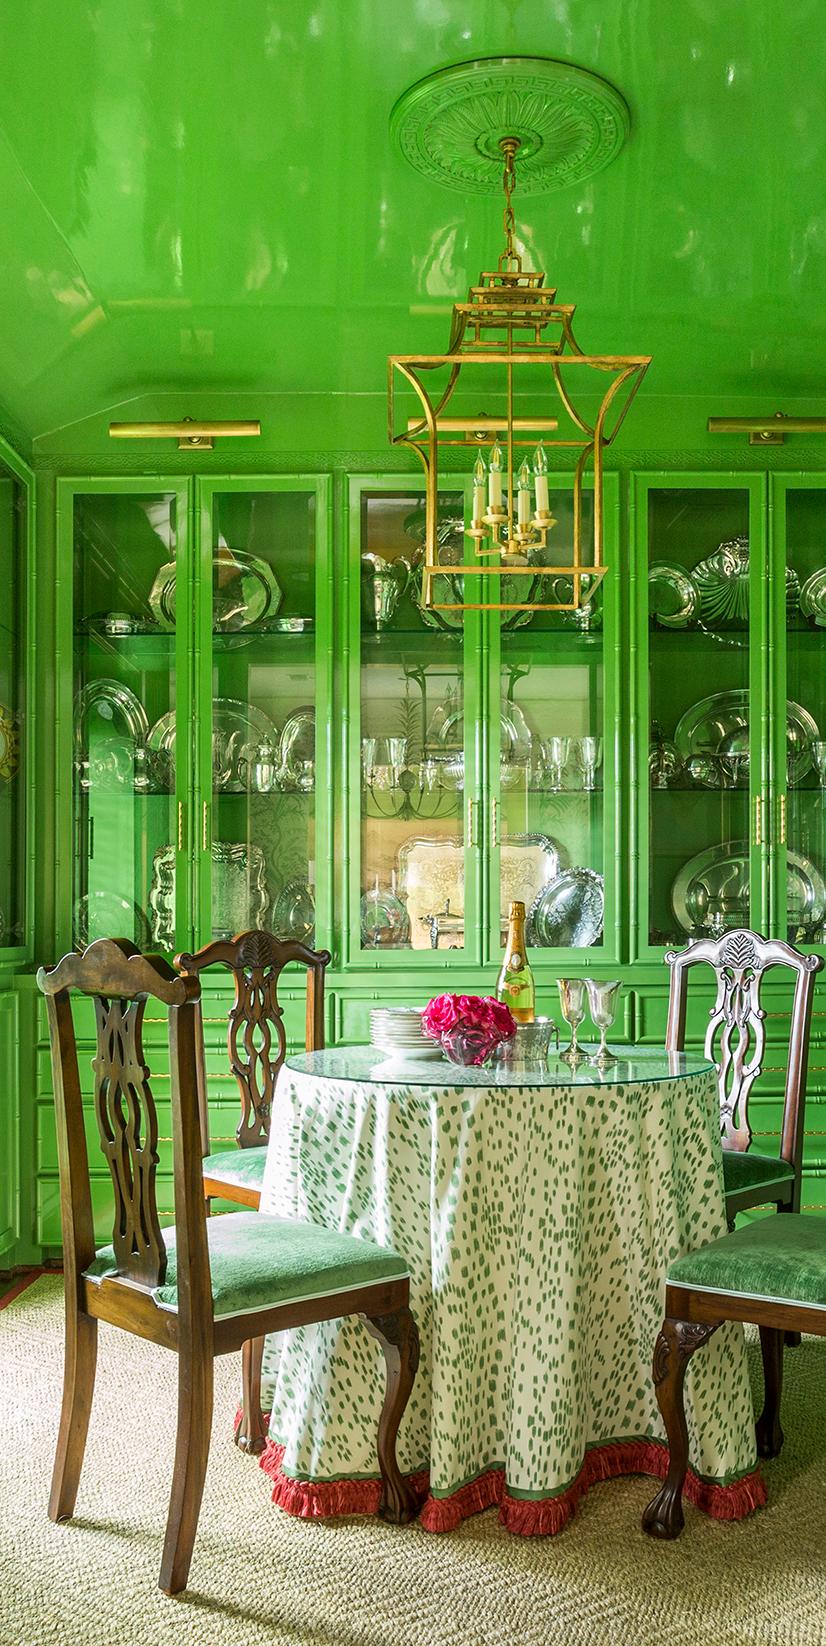 creative tonic - houston based interior designer